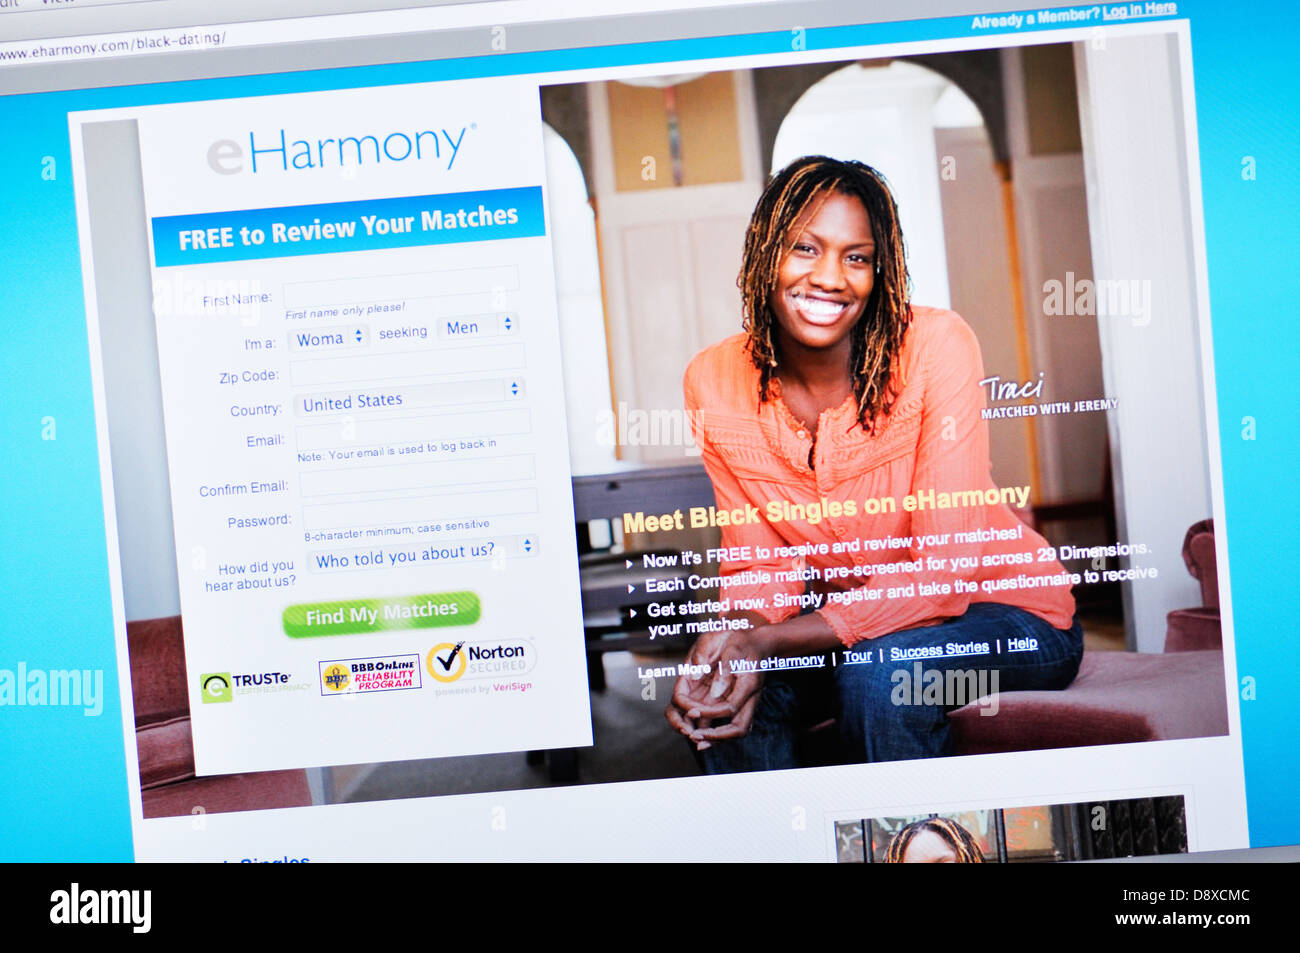 Harmony online dating site